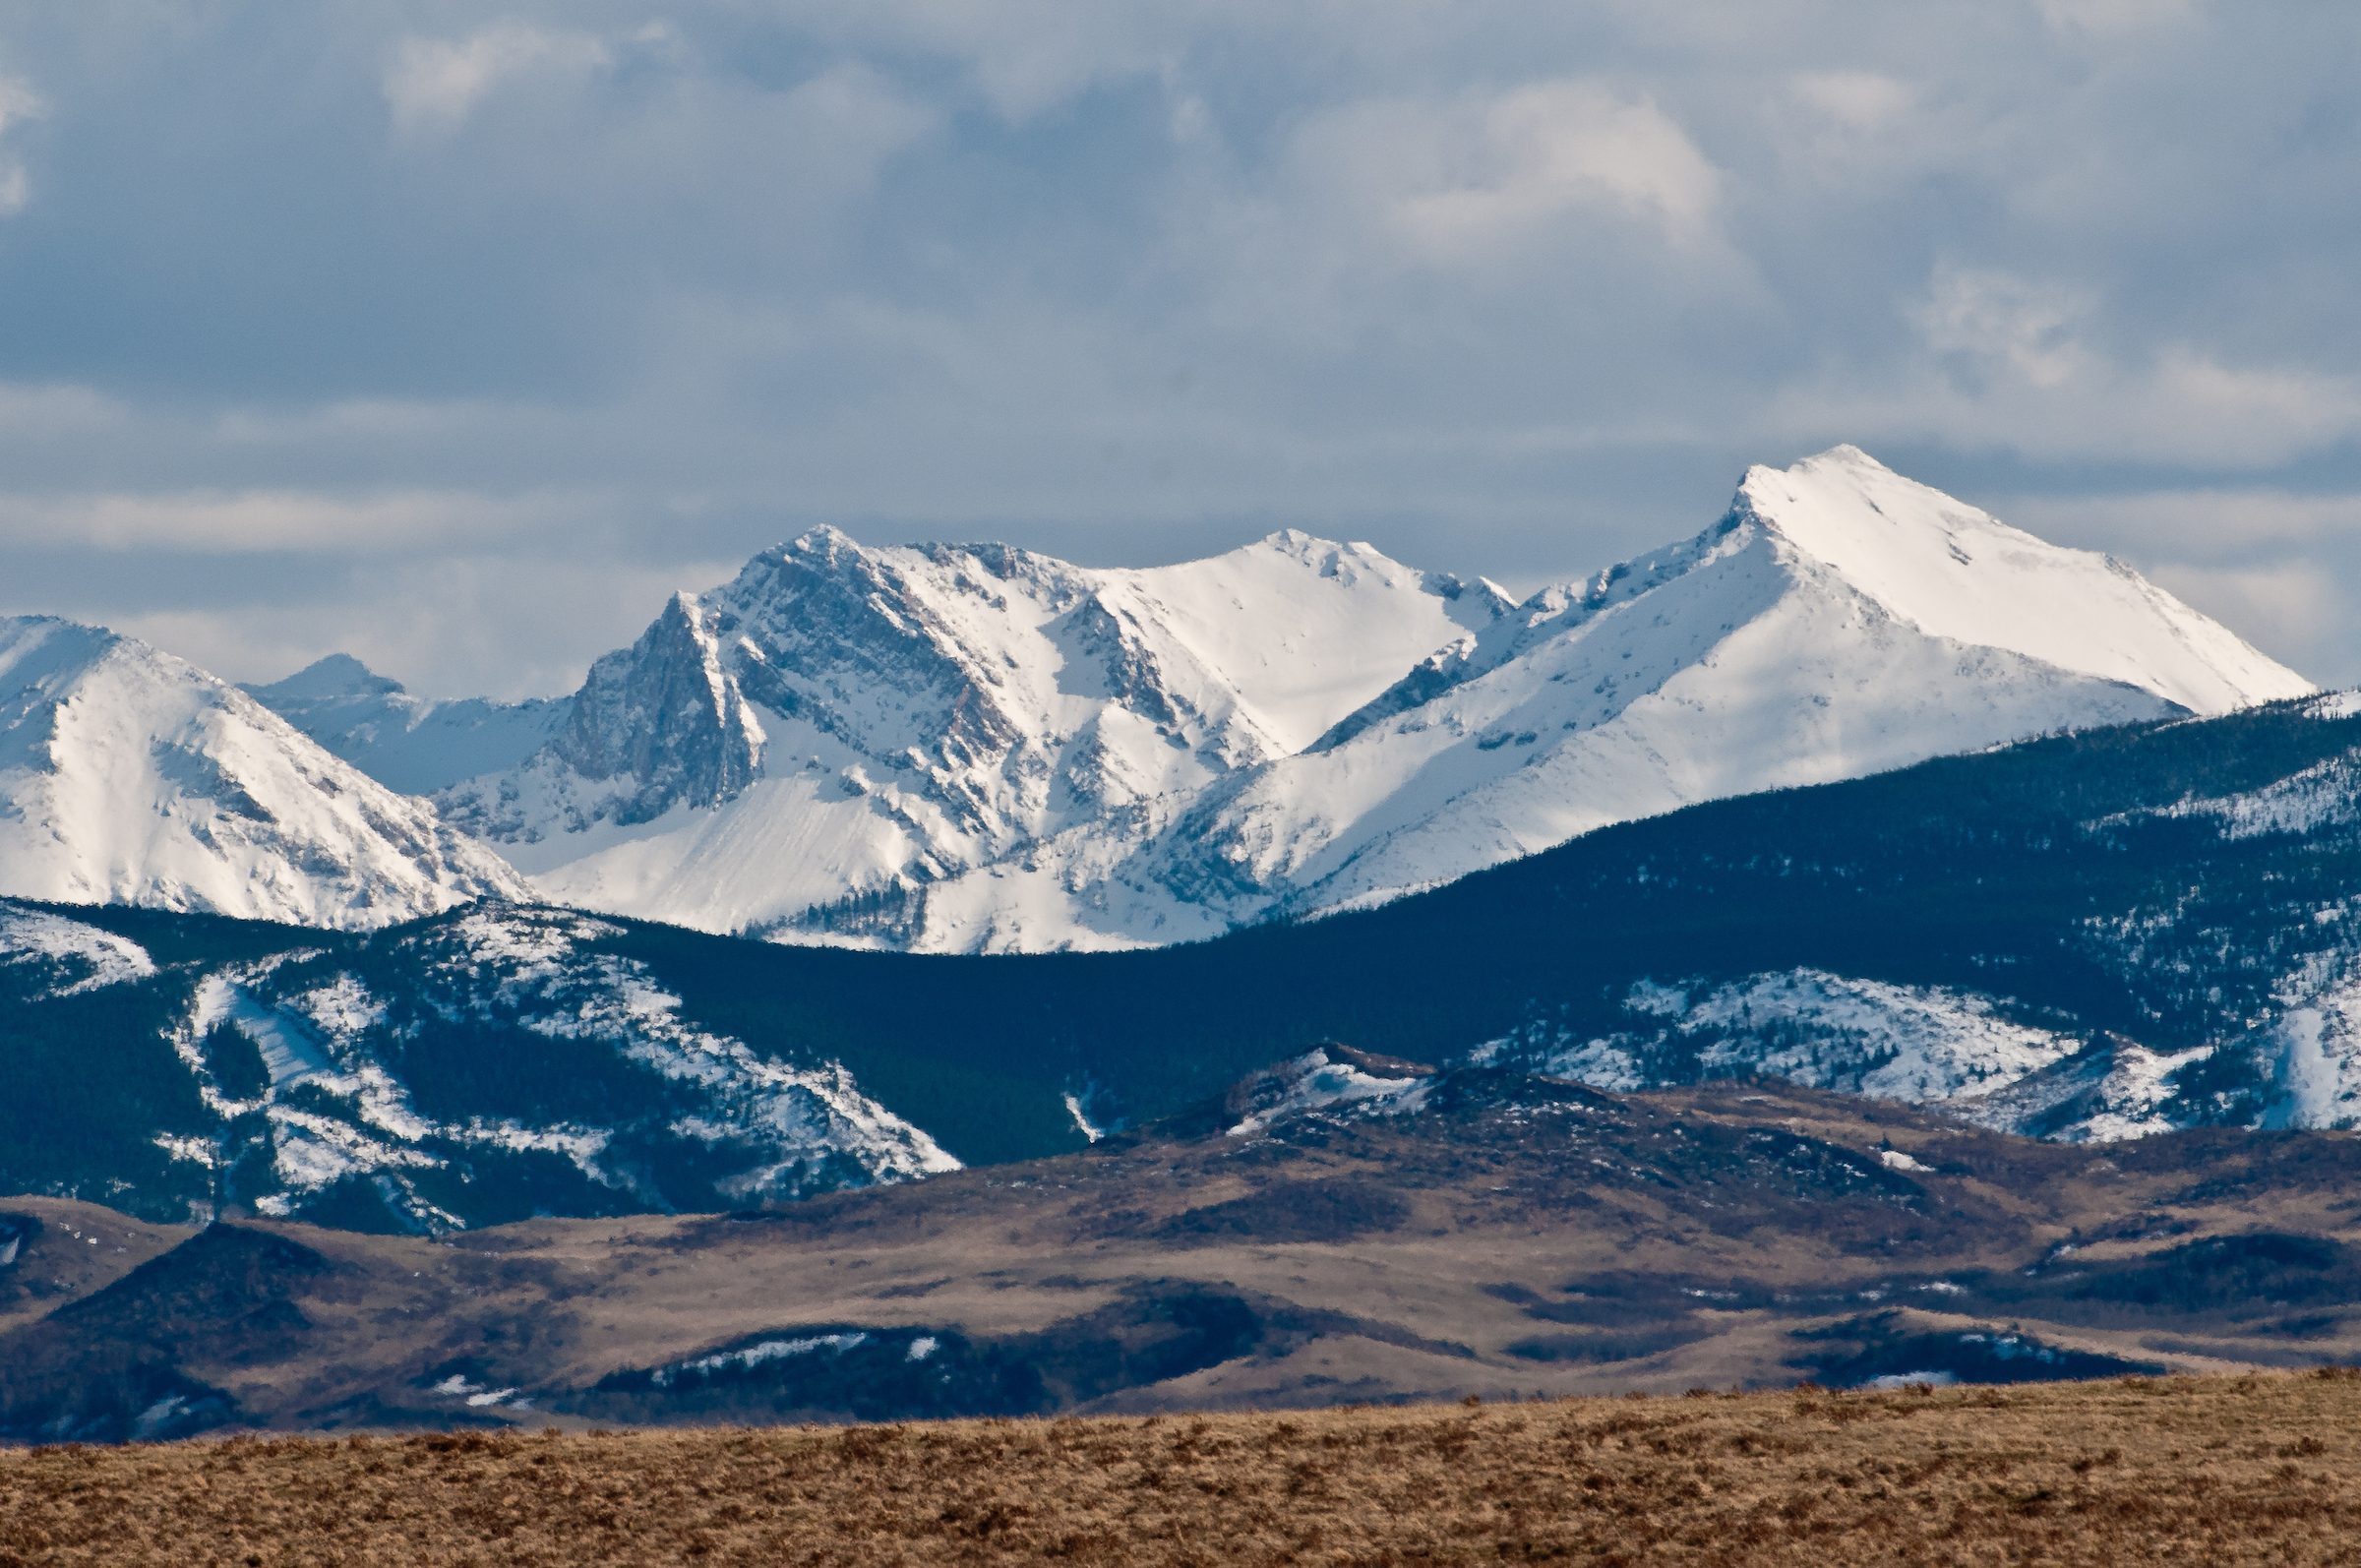 The Badger Two Medicine, Montana